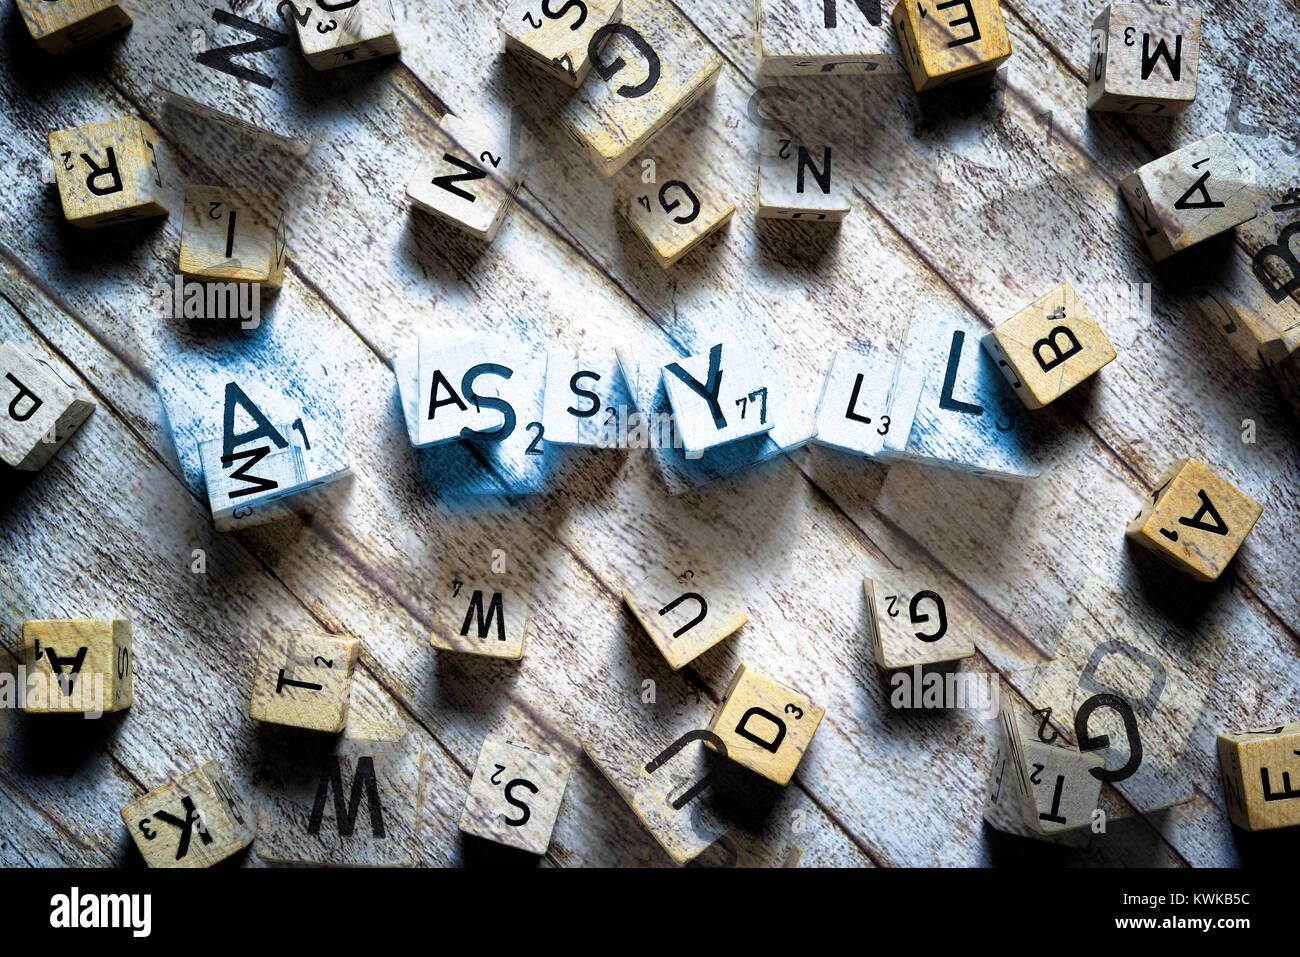 Letter cubes form the word Asylum, Buchstabenw?rfel formen das Wort Asyl - Stock Image